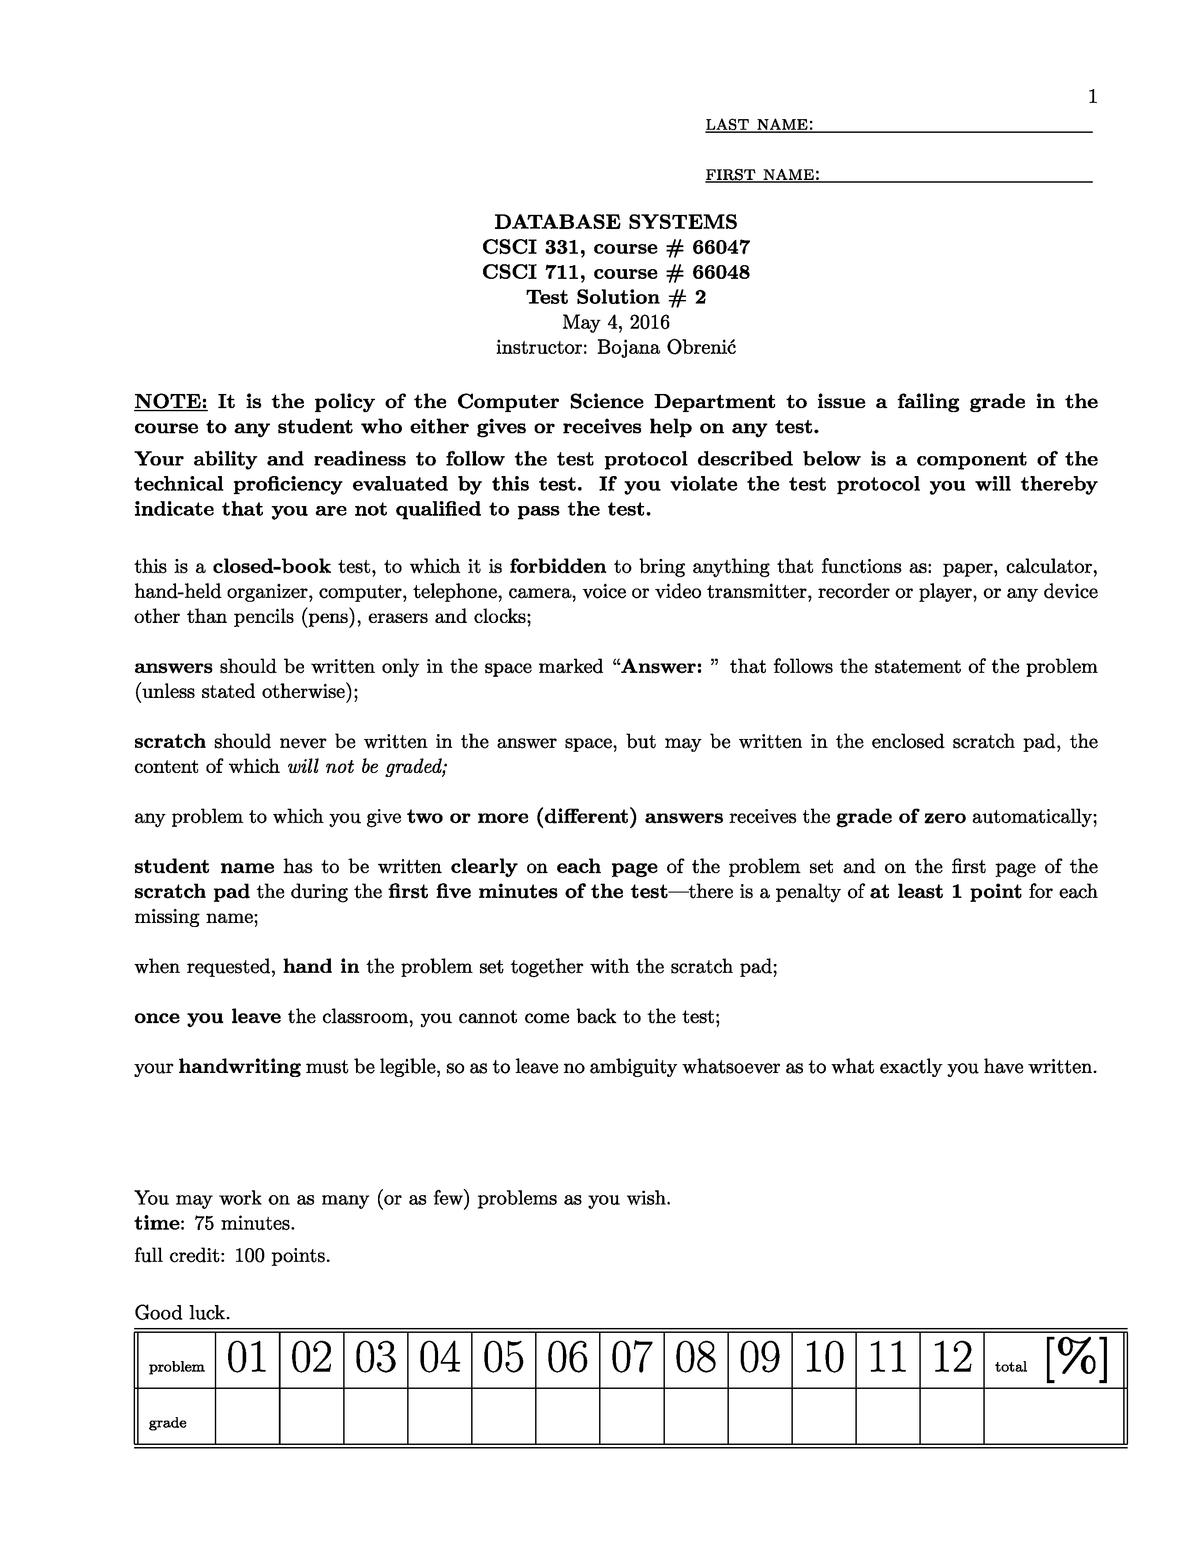 Exam 2014 - CSCI 331: Database Systems - StuDocu